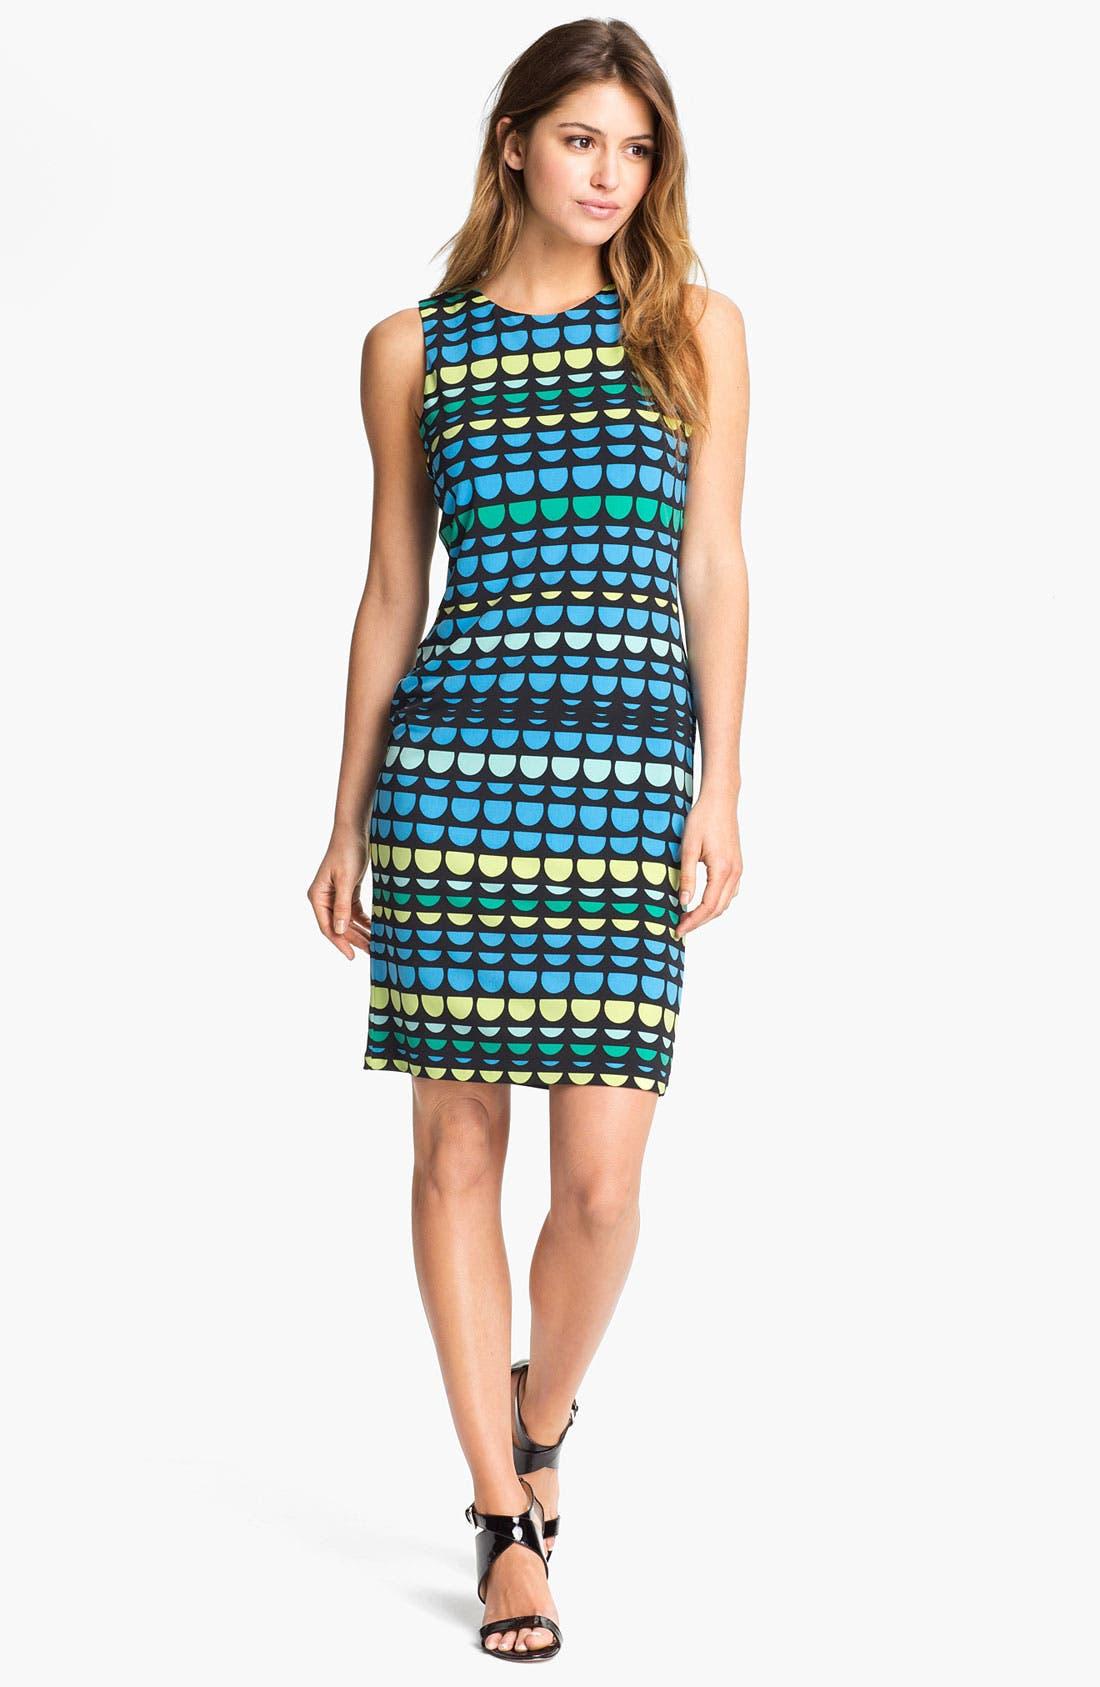 Main Image - Vince Camuto Semi Circle Print Sleeveless Dress